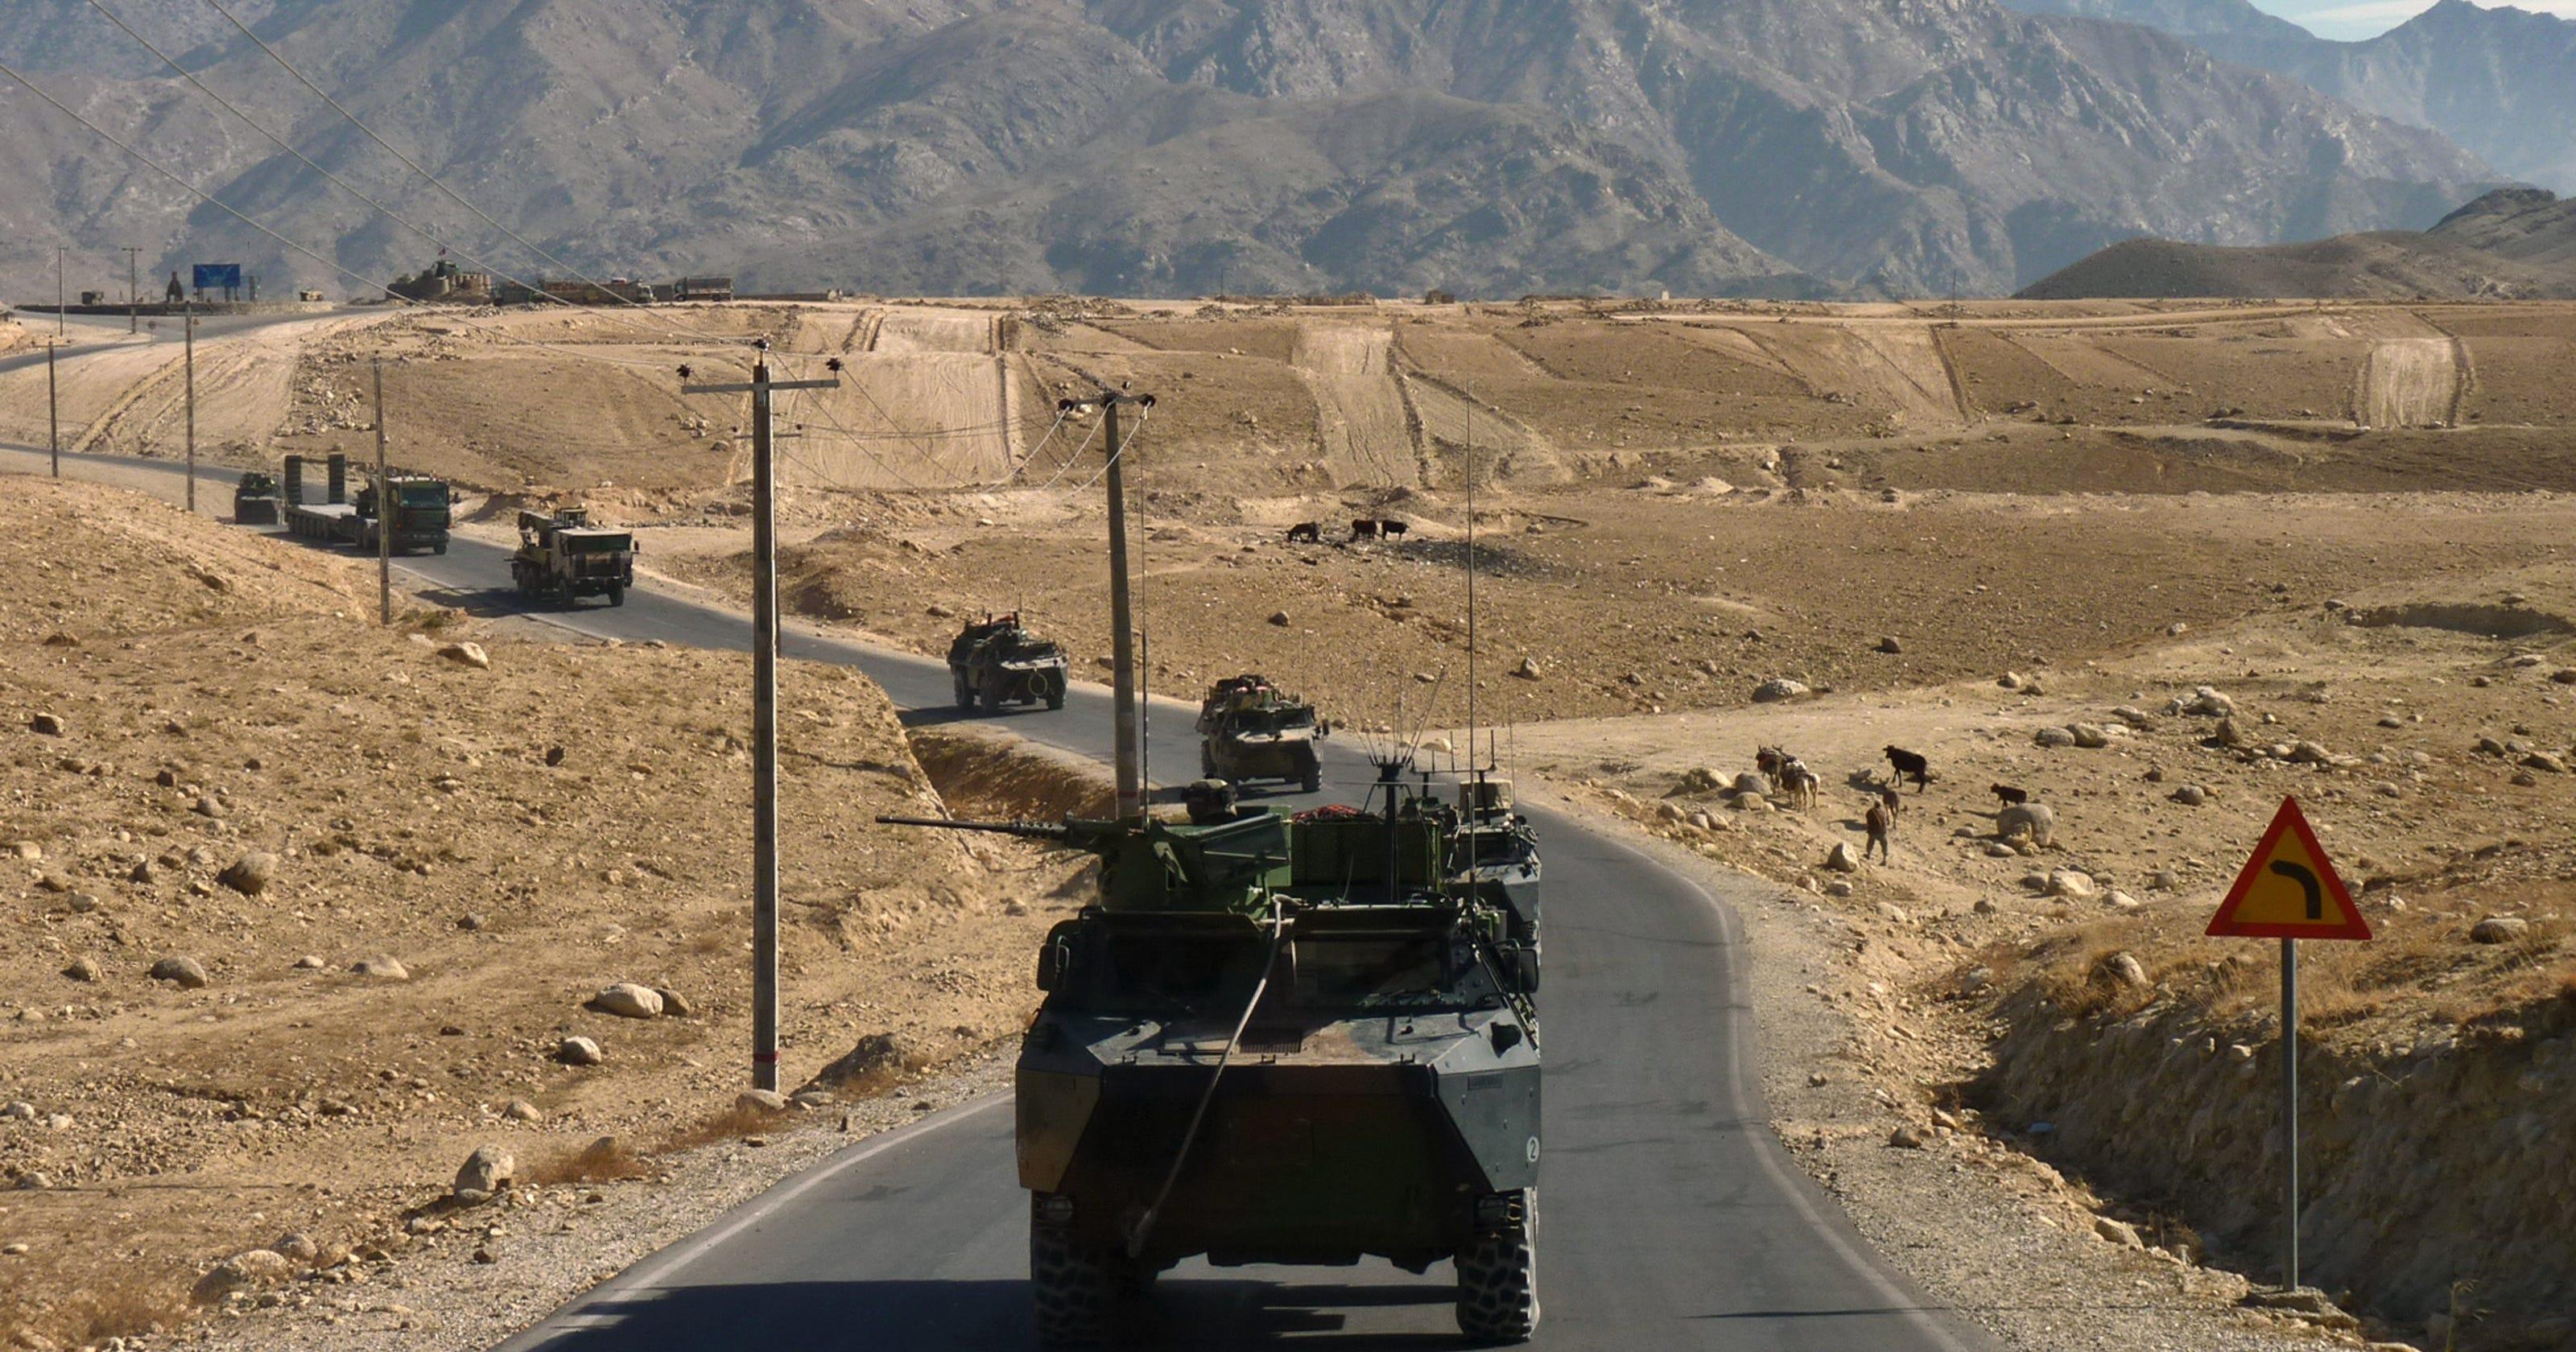 VA finds sexual assaults more common in war zones